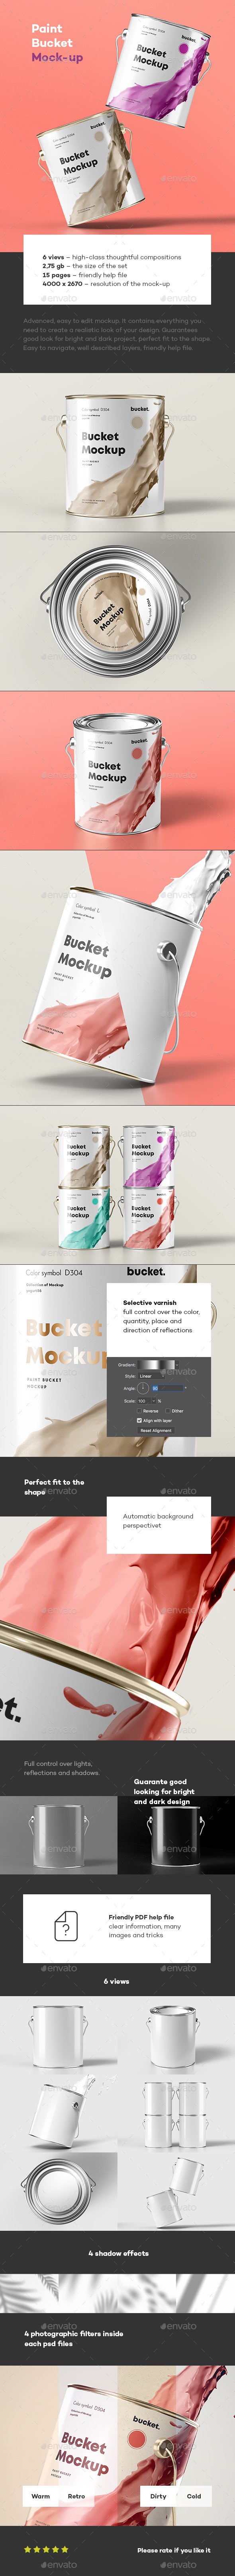 Paint Bucket Mock-up